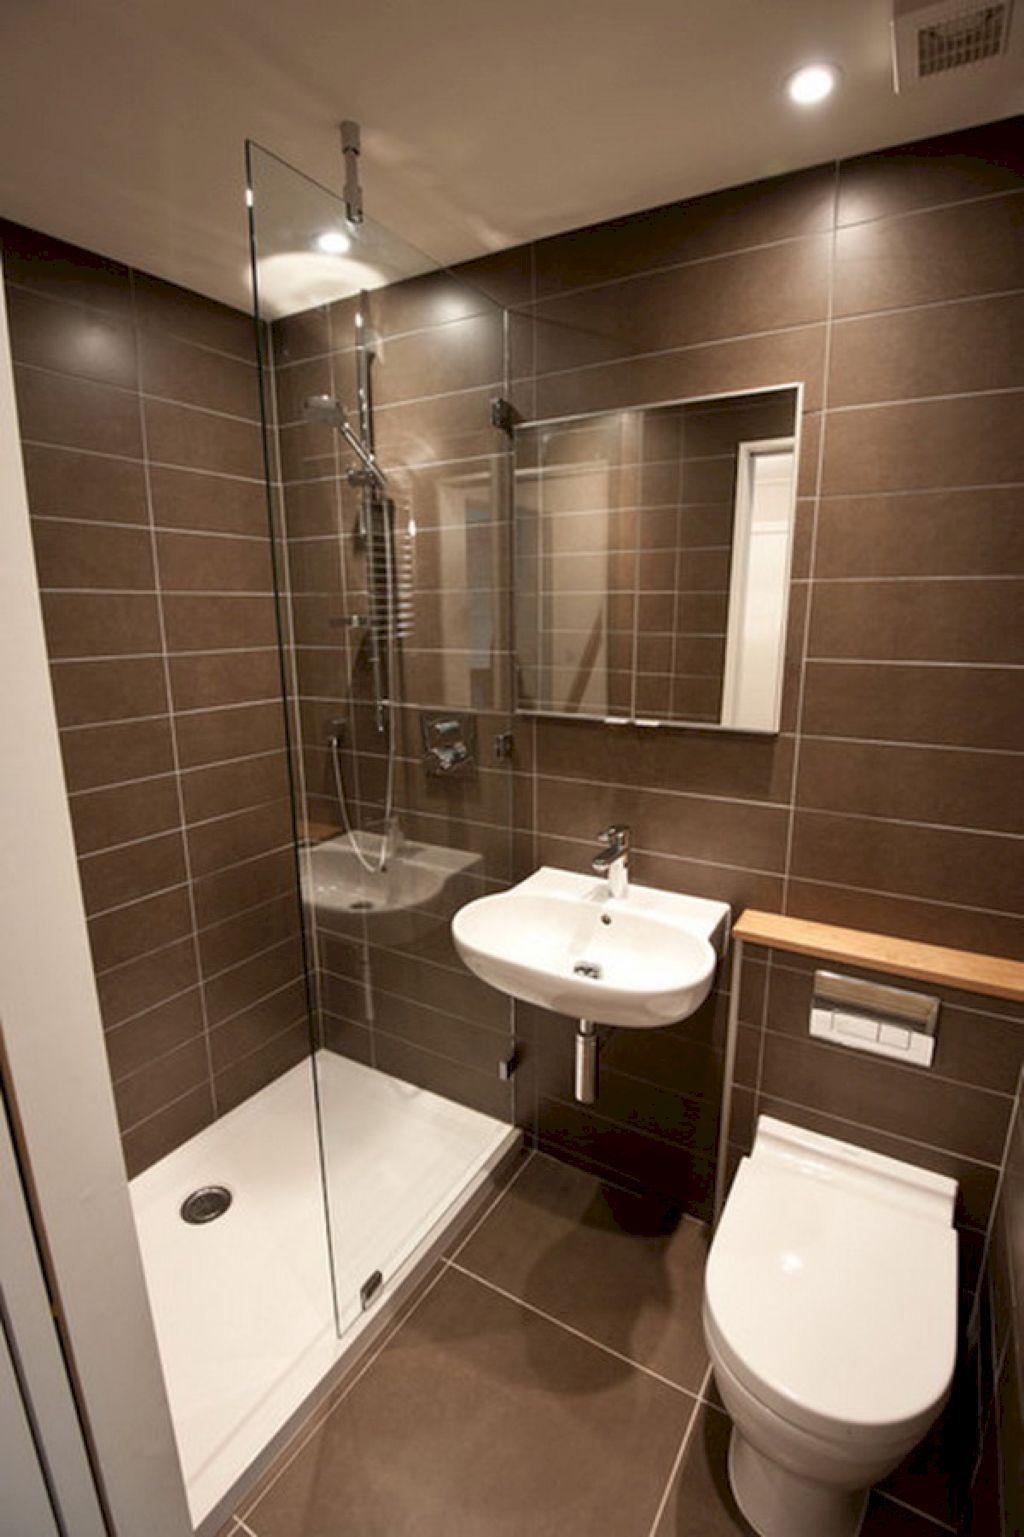 small bathroom designs. Adorable 70 Inspiring Small Bathroom Remodel Ideas Https://bellezaroom.com/2018/04/08/70-inspiring-small-bathroom-remodel-ideas / Designs N